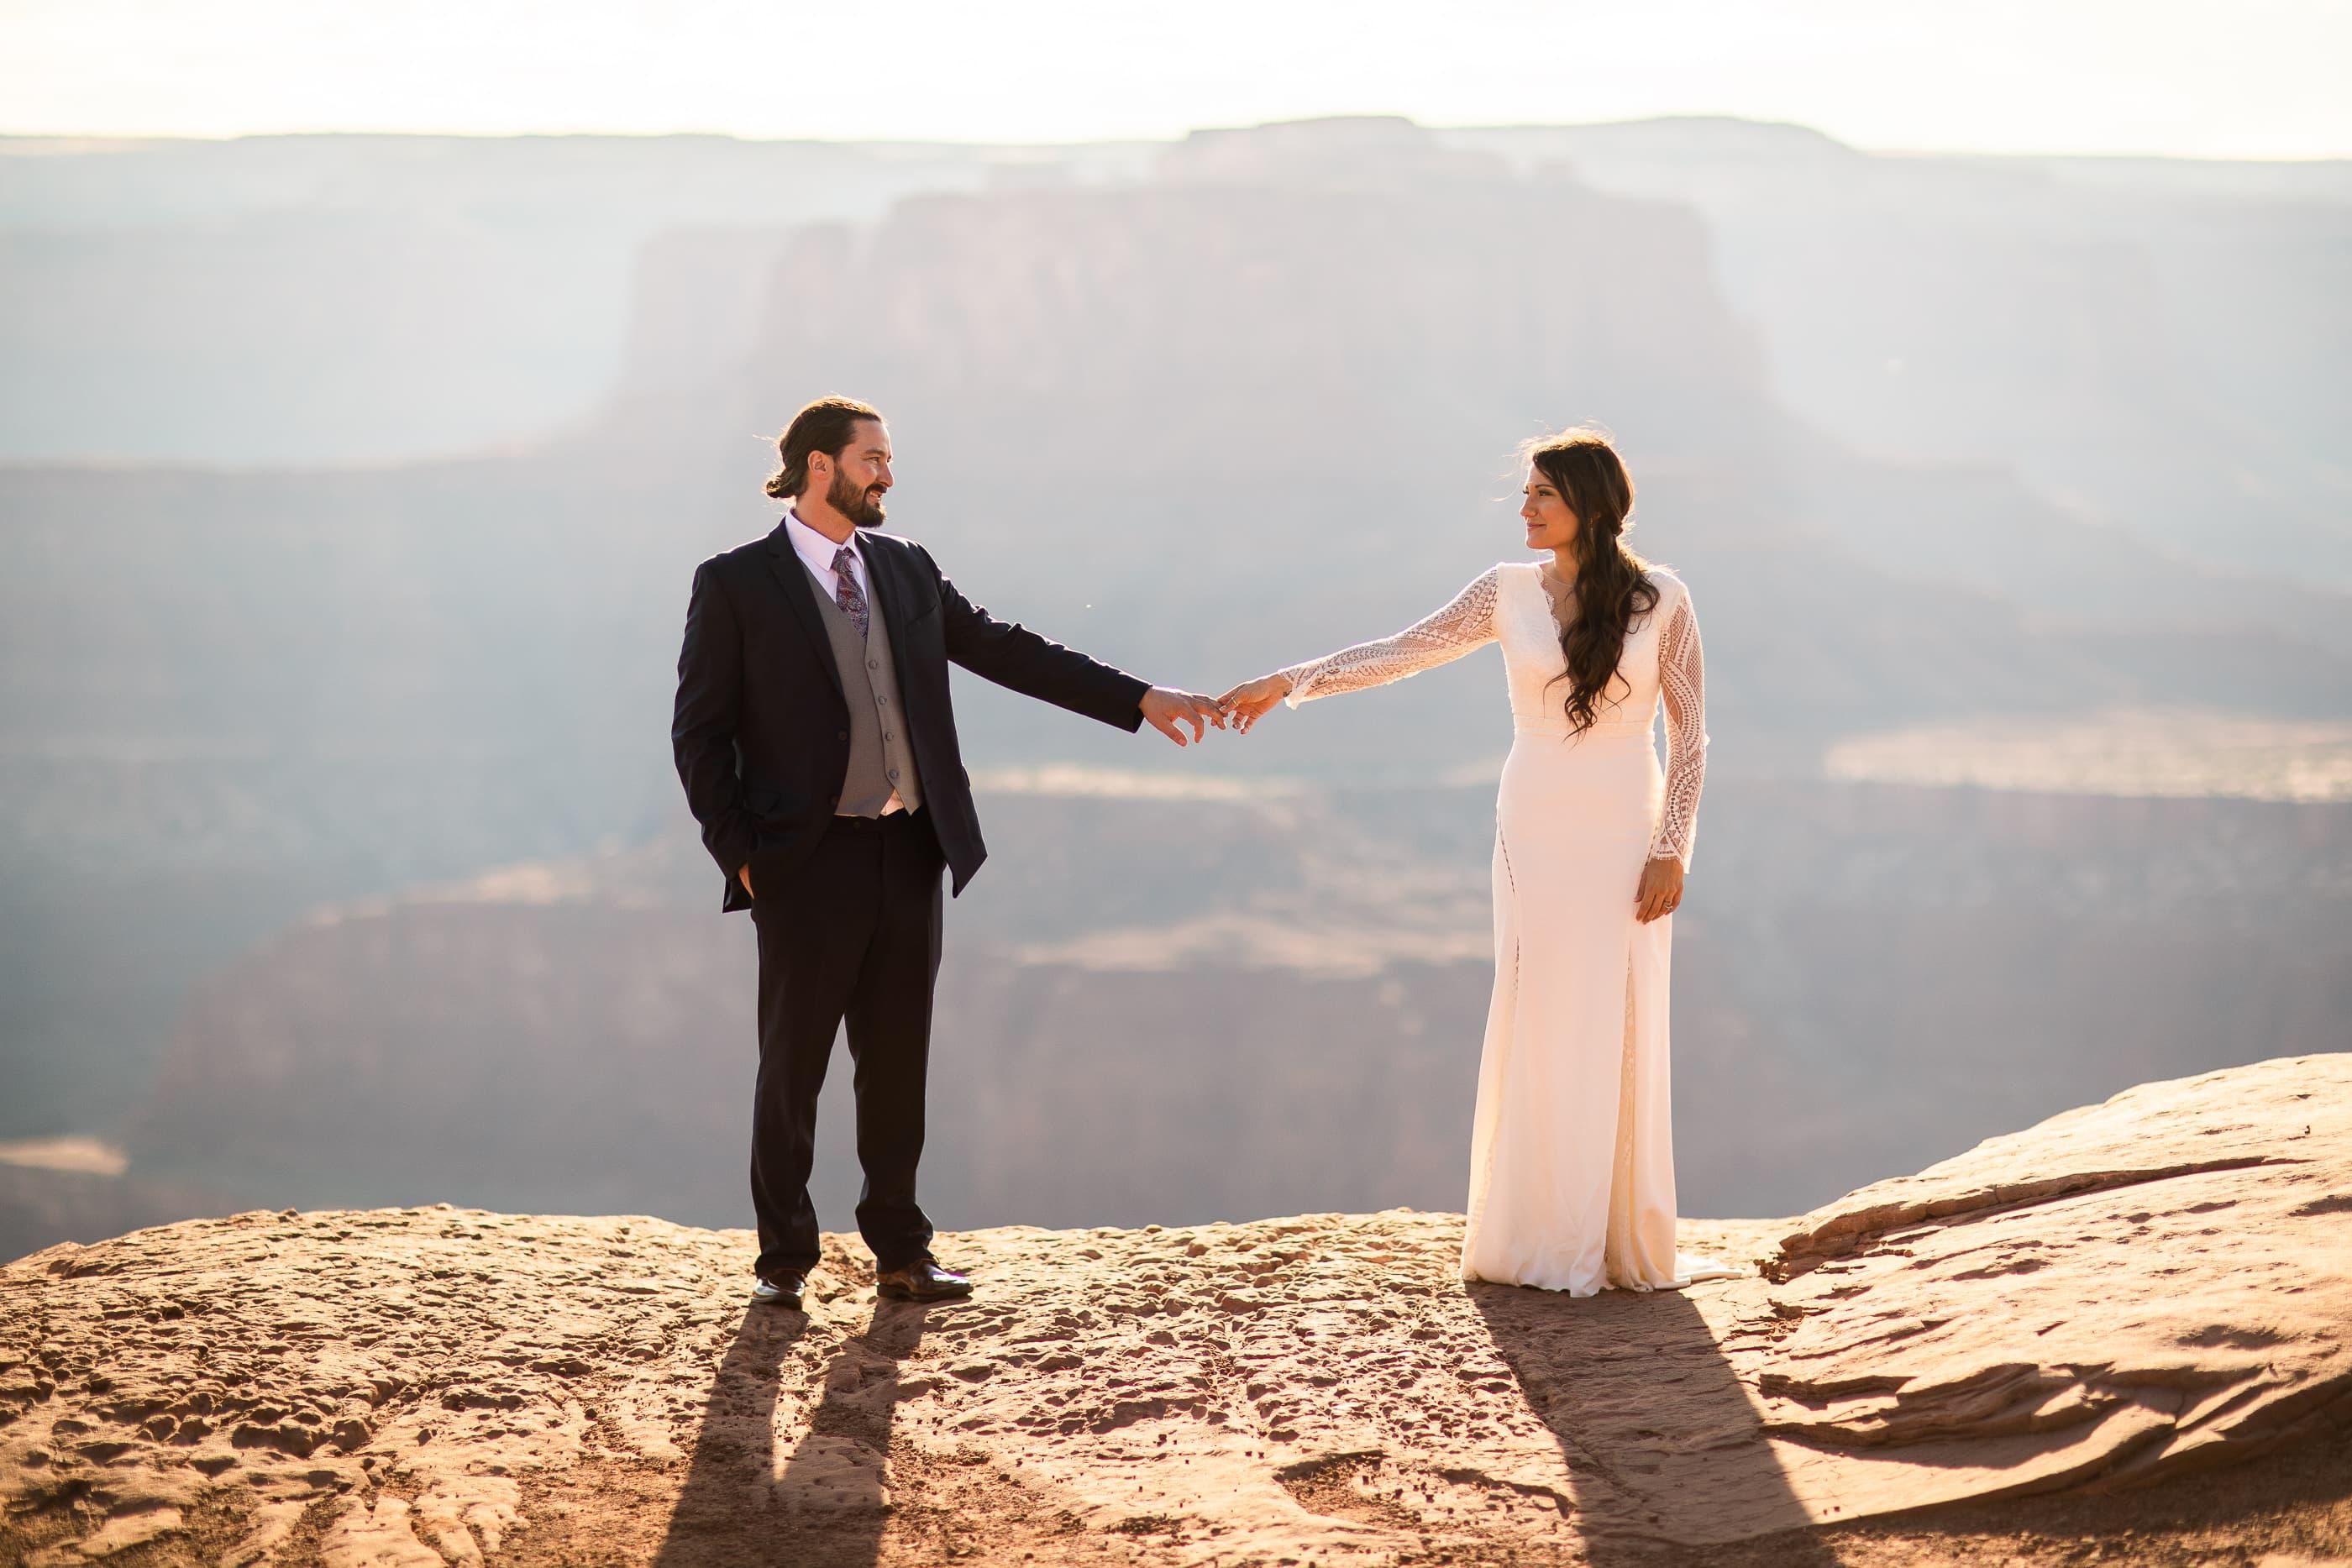 Planning a Destination Wedding in Moab